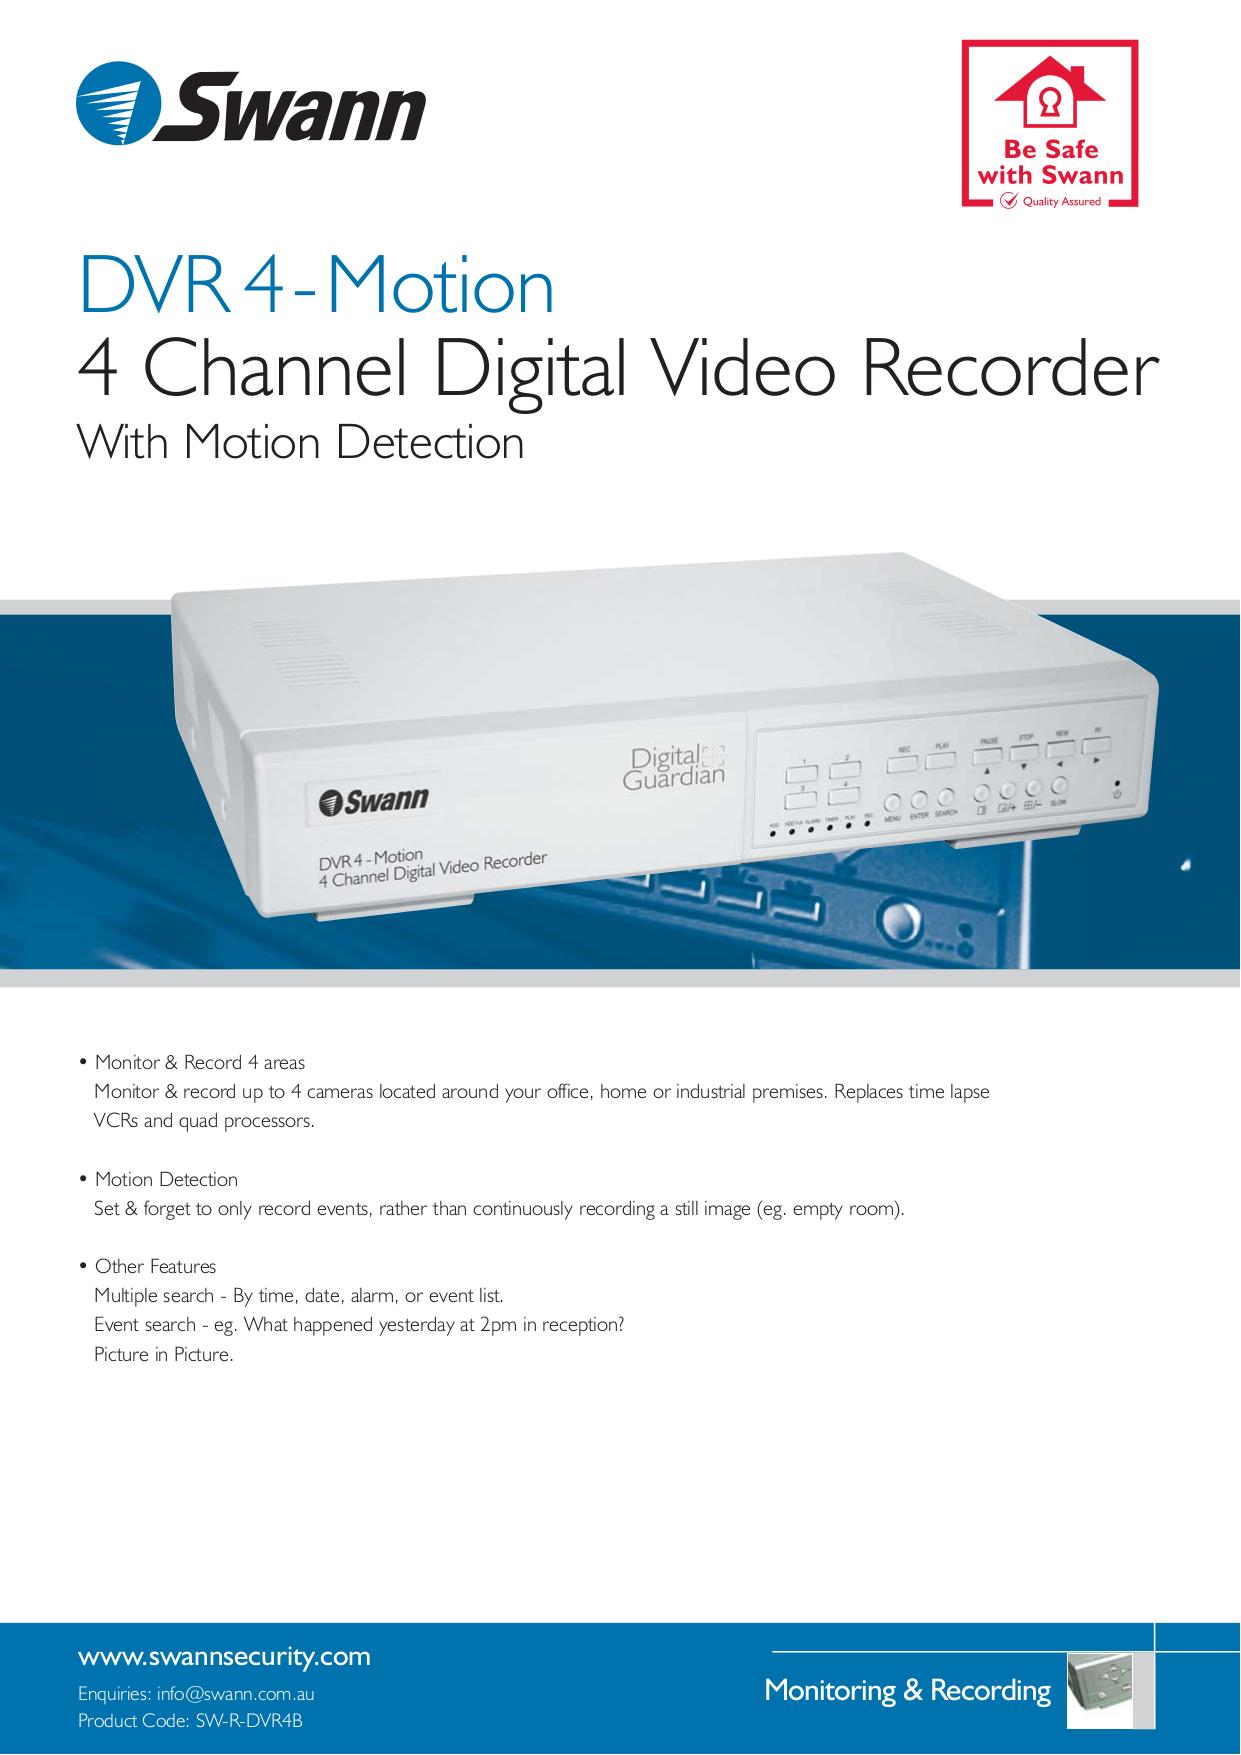 Download free pdf for Swann SW-R-DVR4 DVR manual